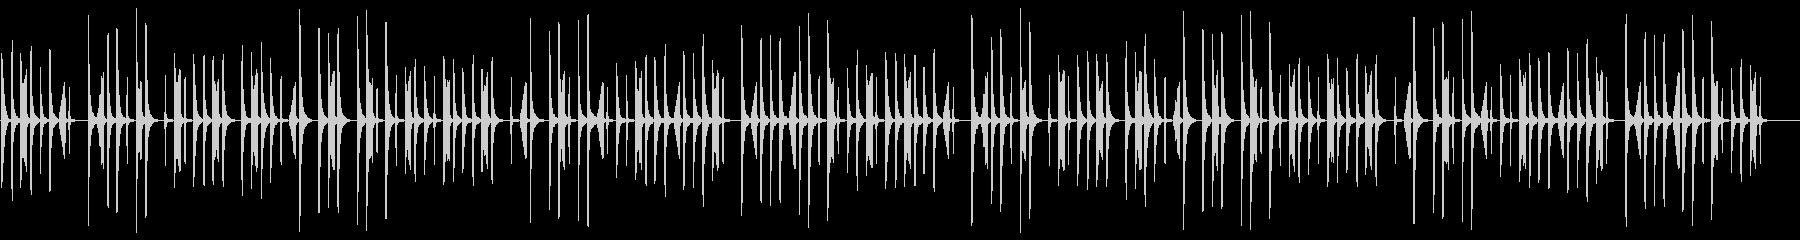 CM、木琴、説明、商品紹介系BGM6の未再生の波形